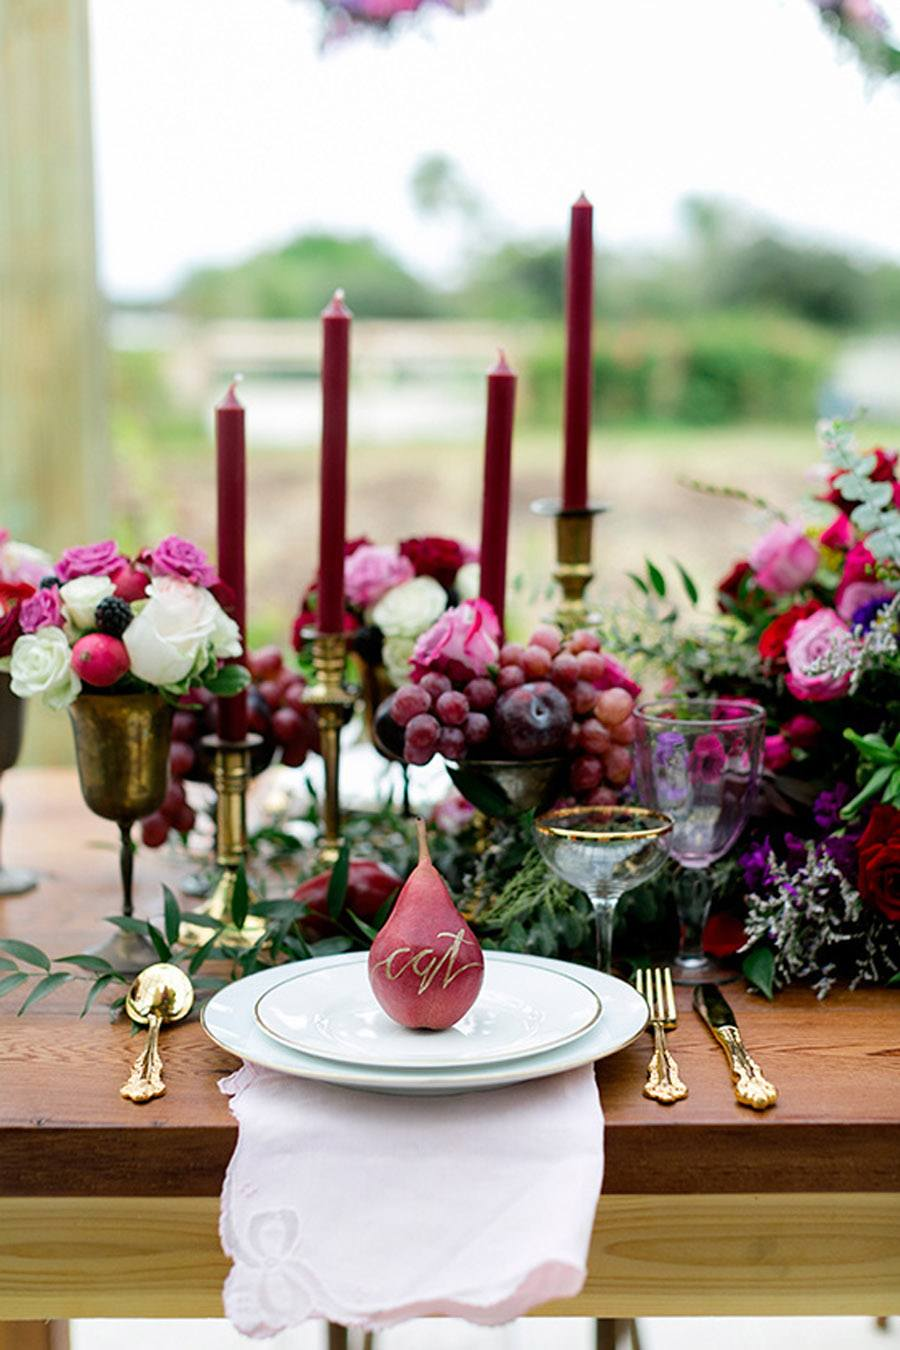 DECORACIÓN DE BODA CON UVAS decoracion-boda-uvas